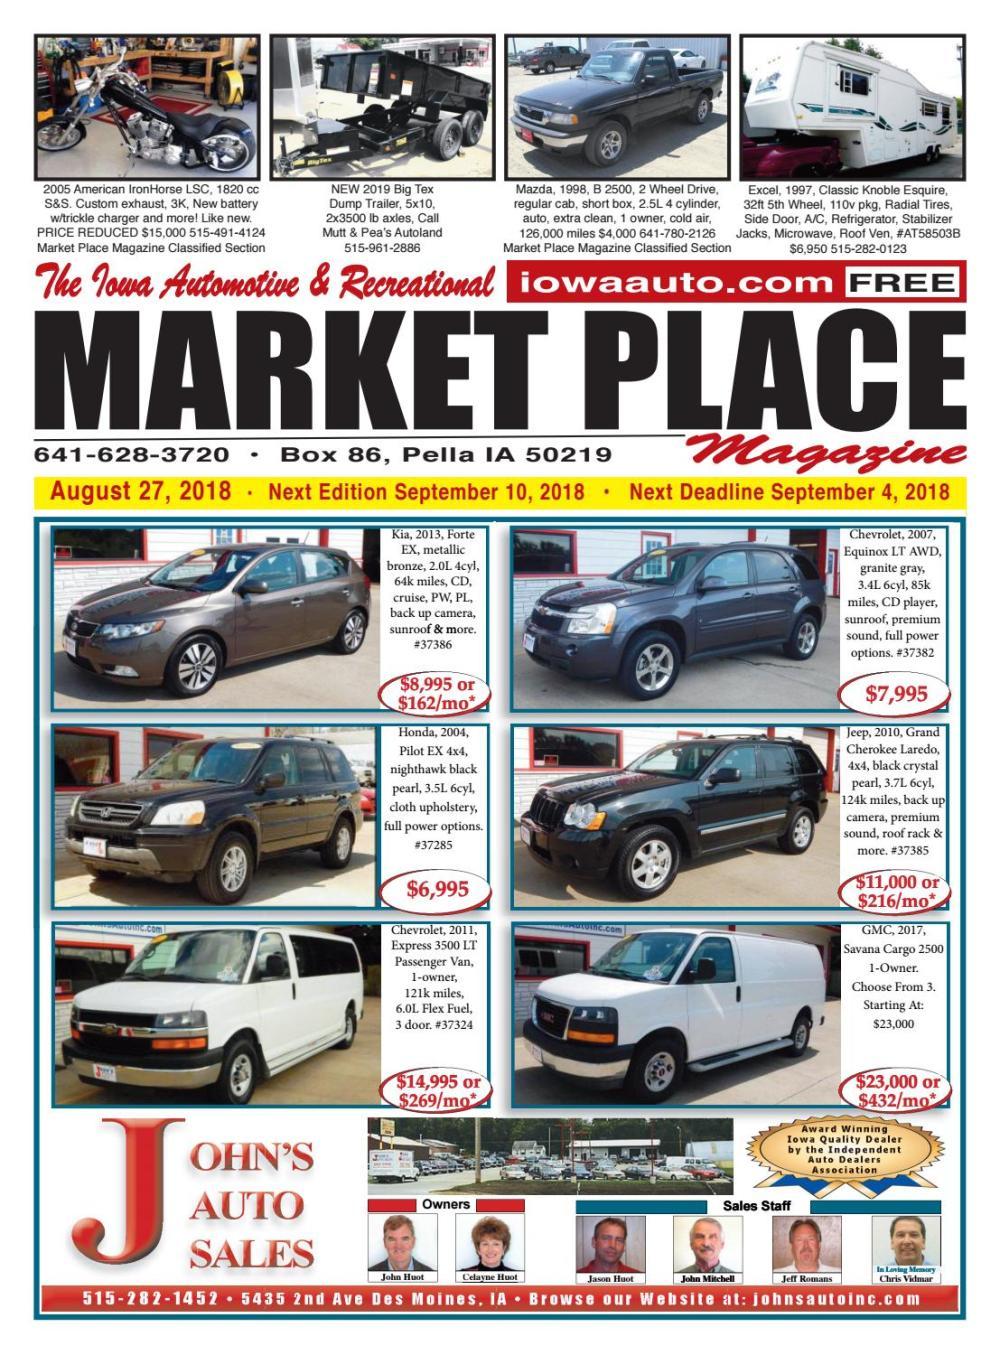 medium resolution of marketplace magazine august marketplace magazine issuu jpg 1107x1500 auto rod controls 3720